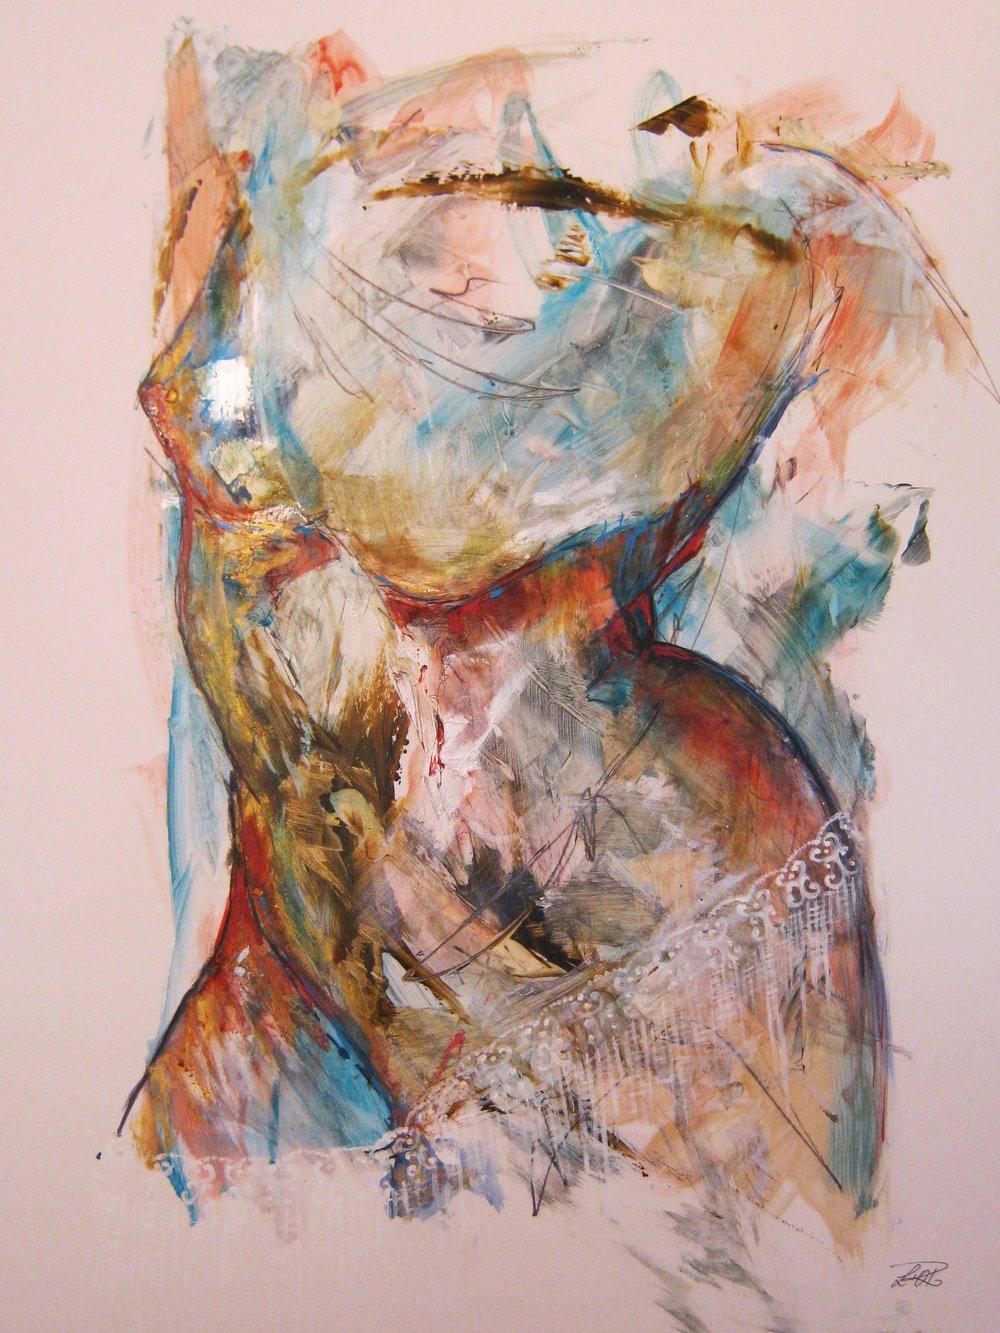 Séductrice - Artiste :LORDimensions : 17.5 x 25.5 in.Médium :Mixte sur papier Terraskin